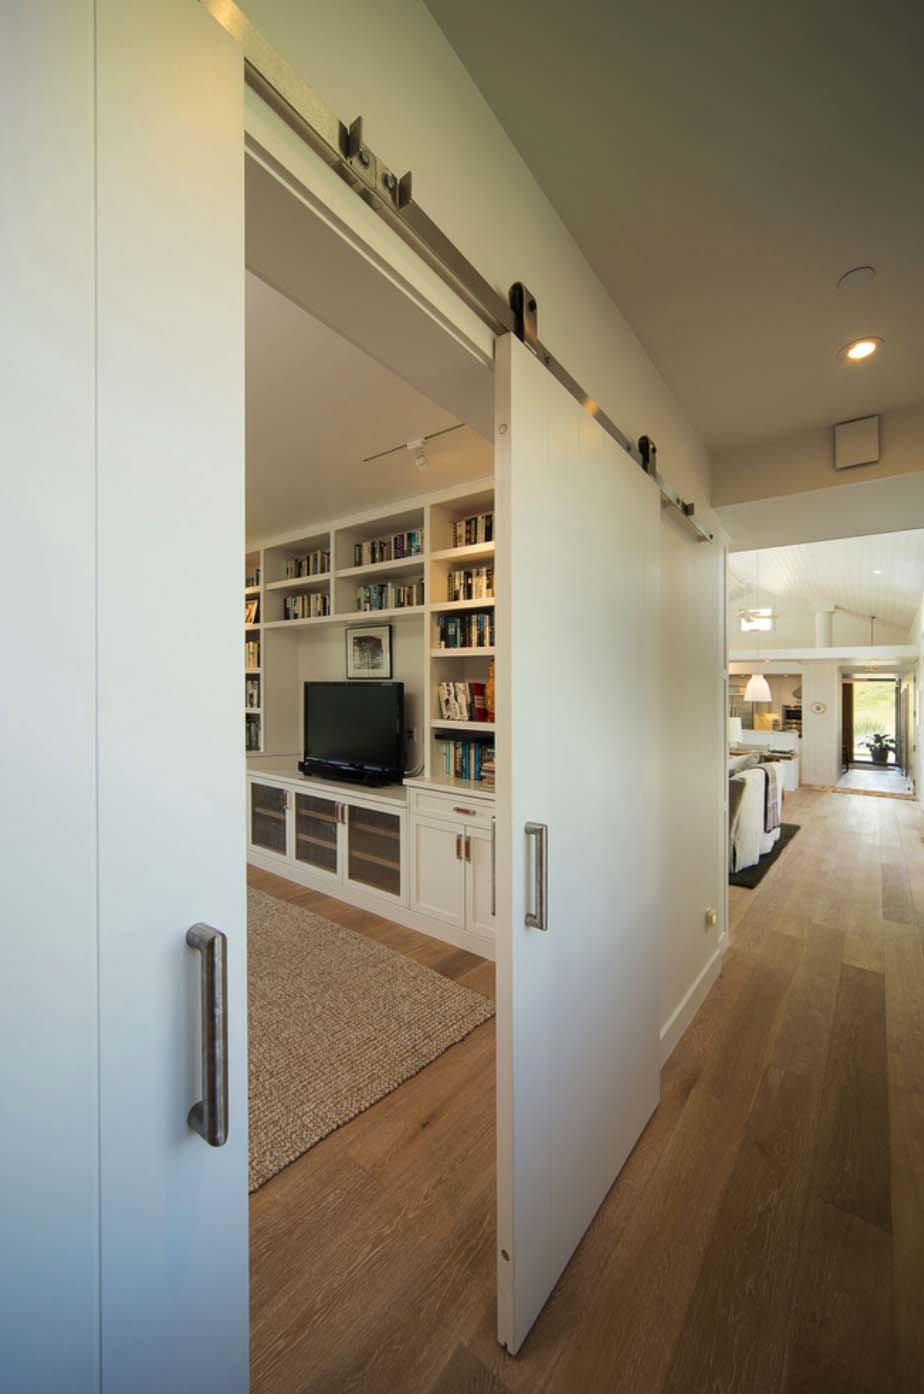 Modern Farmhouse-Gast Architects-17-1 Kindesign